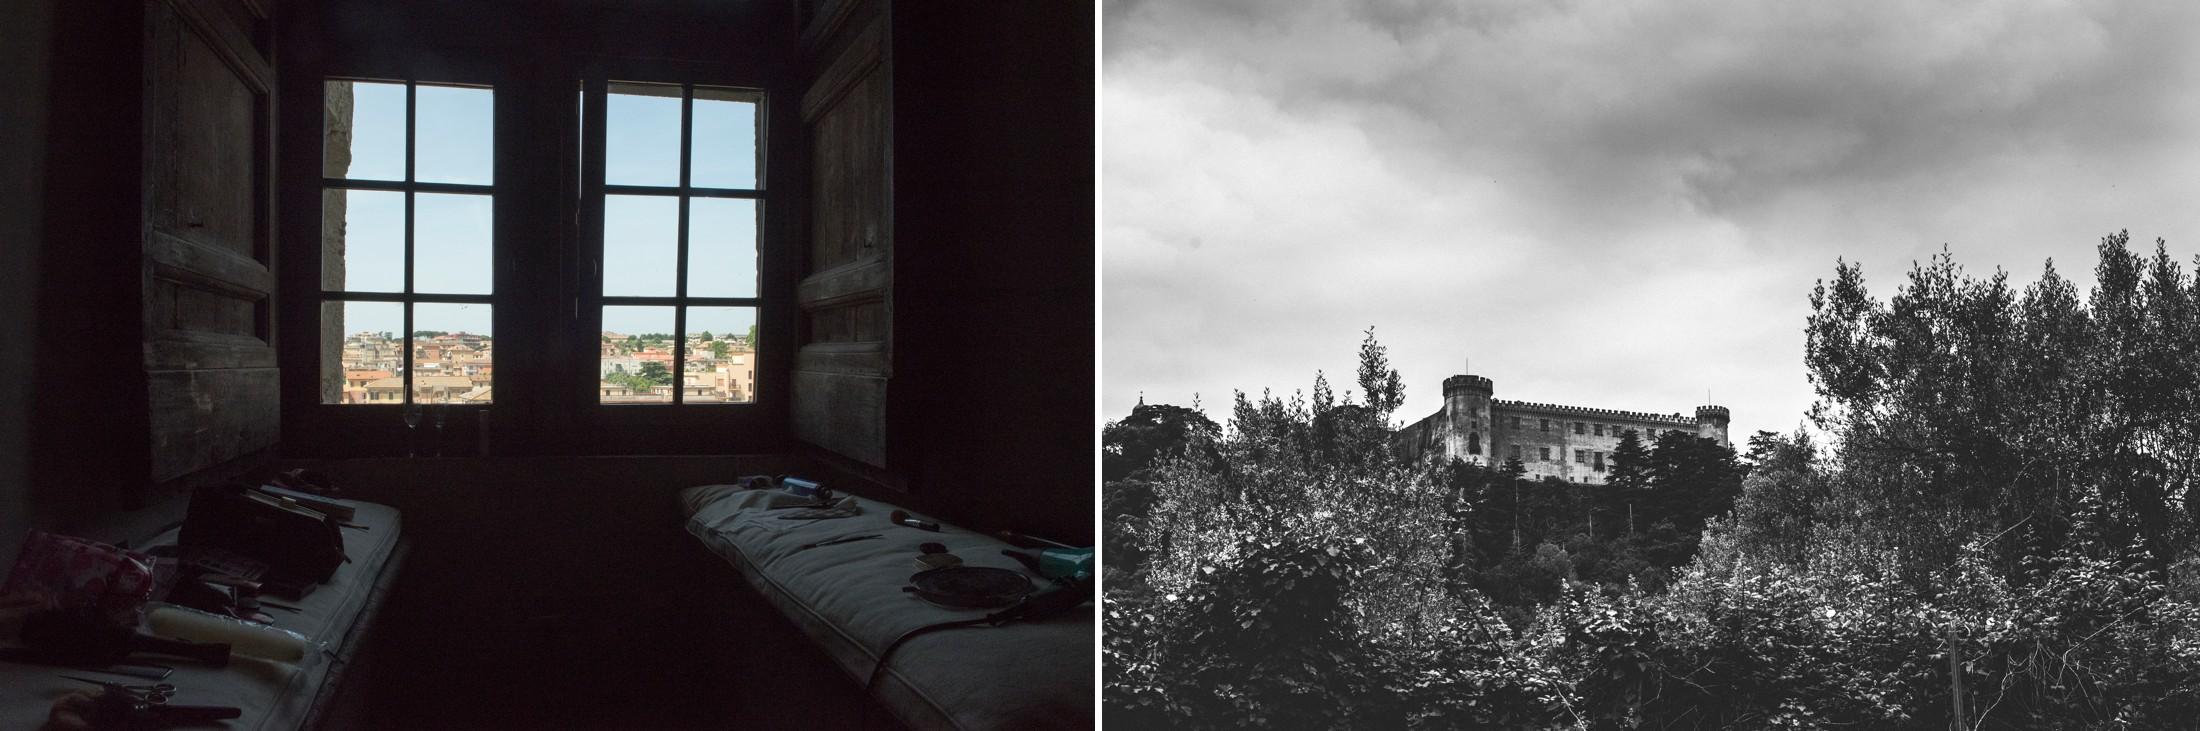 collage castle odescalchi window